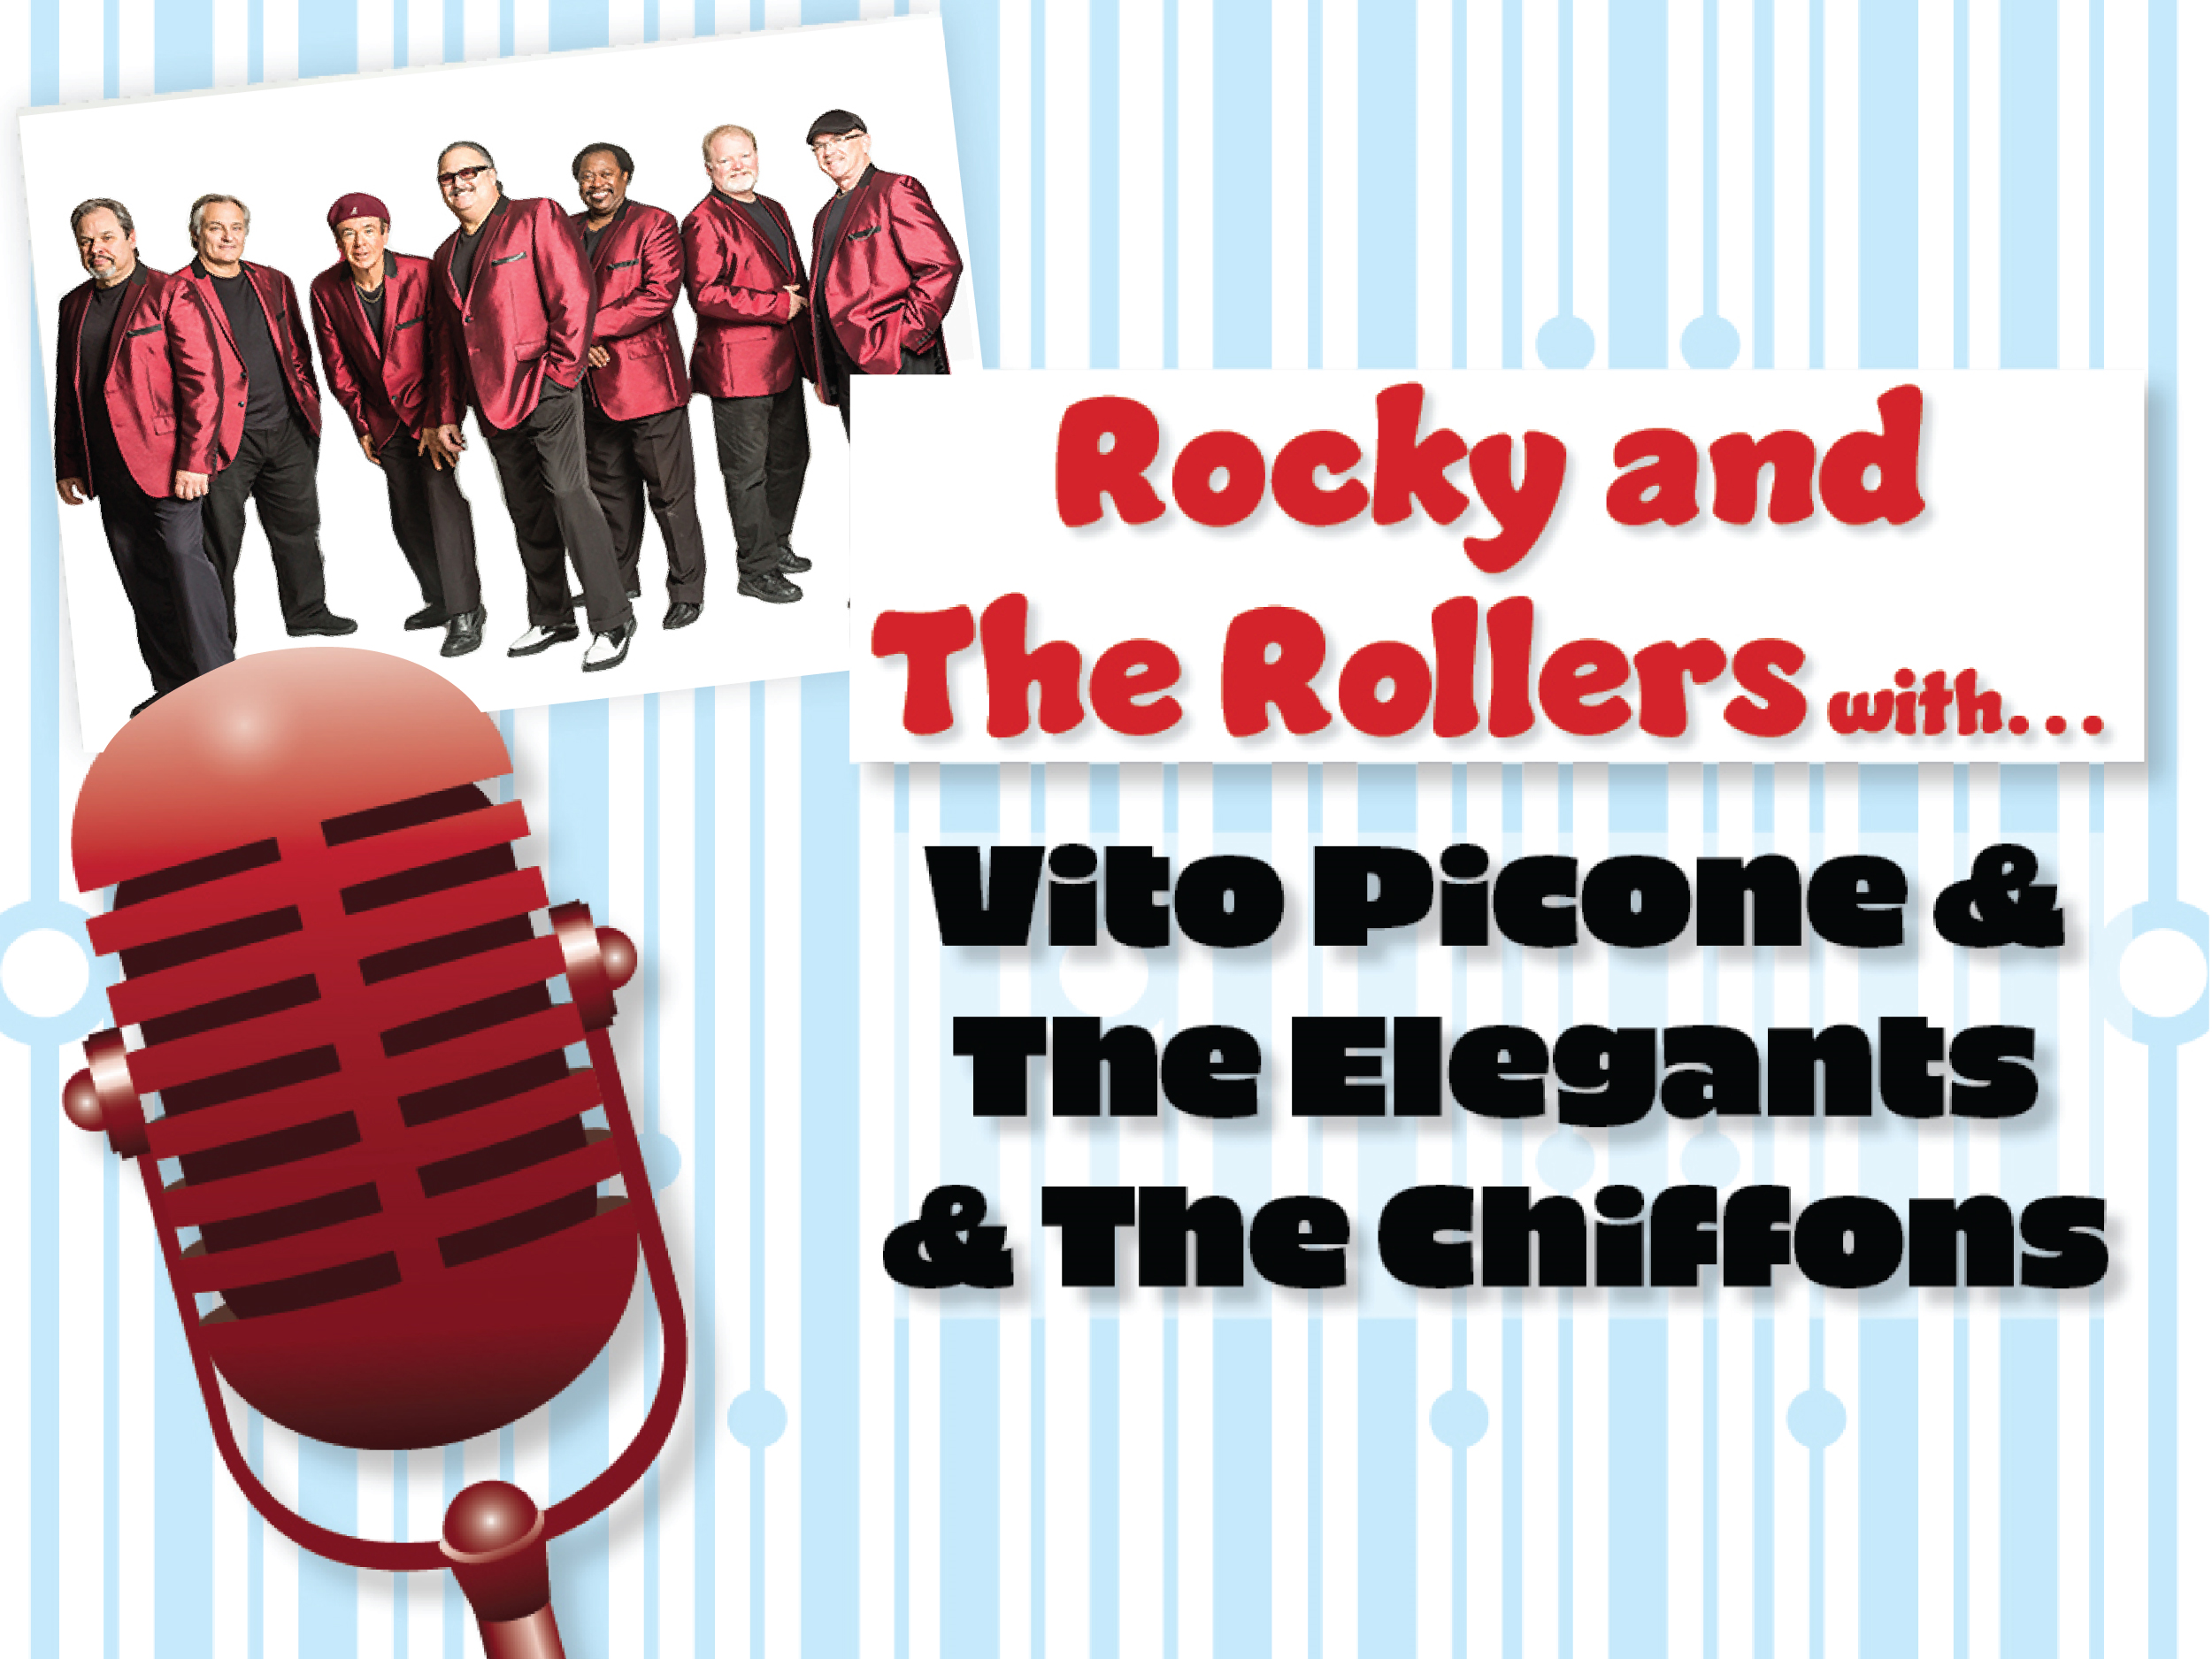 doo wop n rock: vito picone, the elegants, the chiffons Image